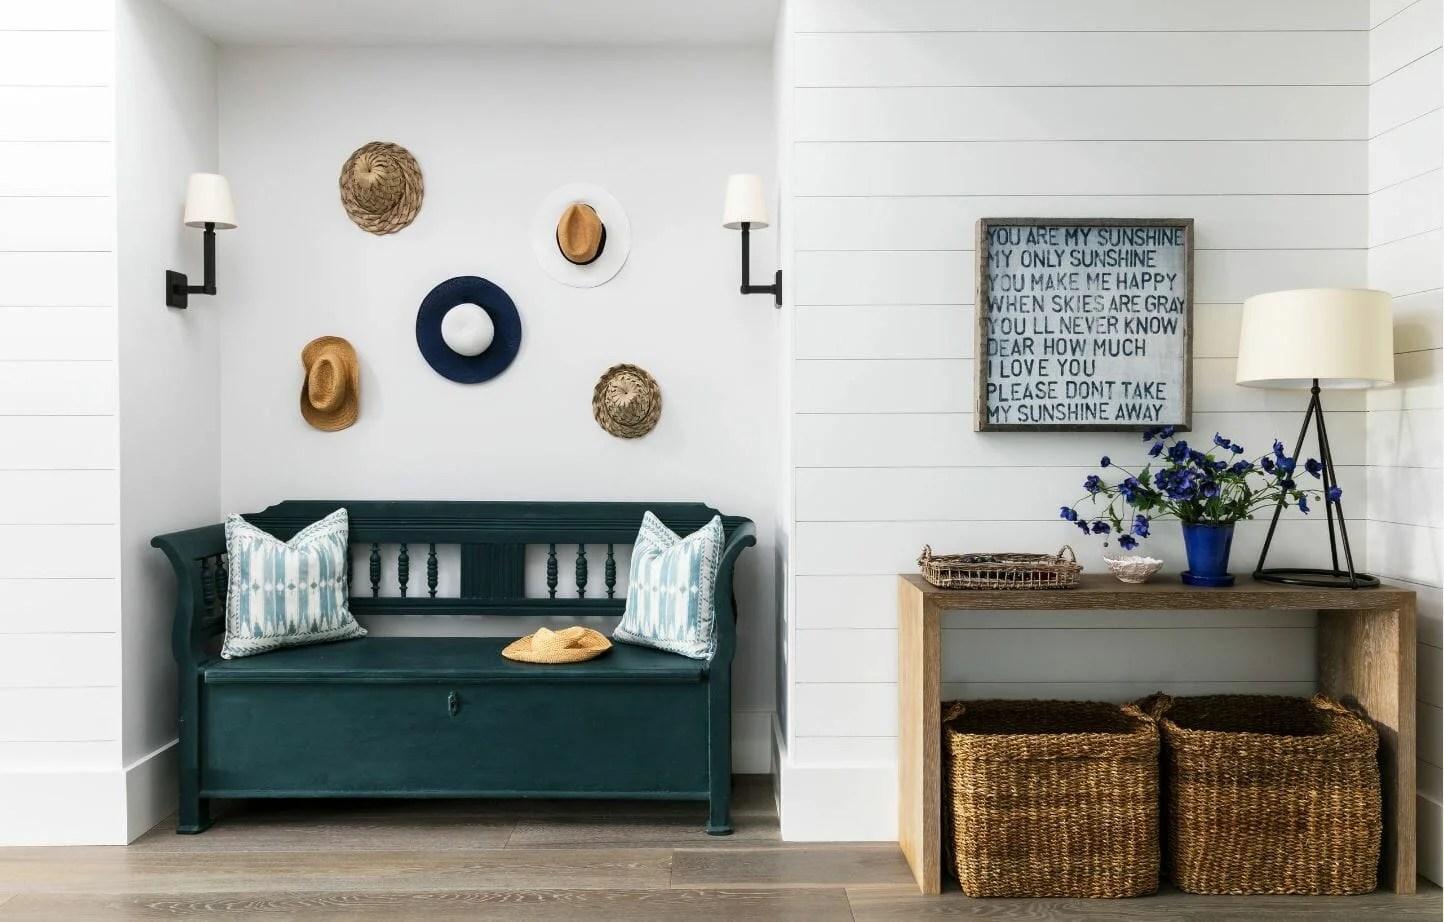 Hallway Decor Ideas 7 Creative Designer Decorating Tips Decorilla